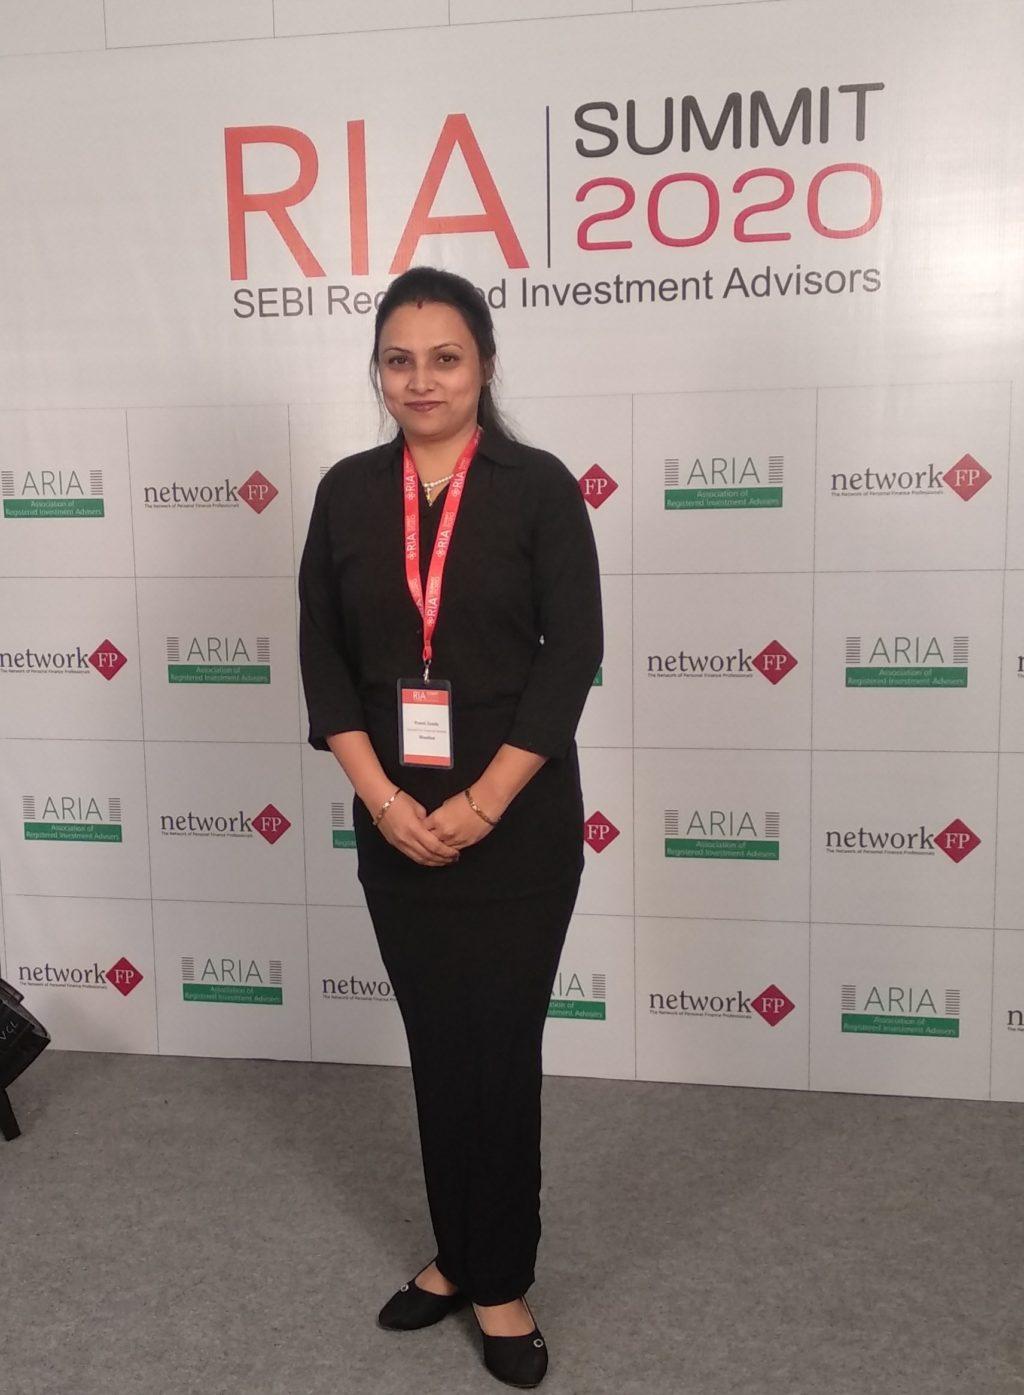 RIA Summit photo.jpg